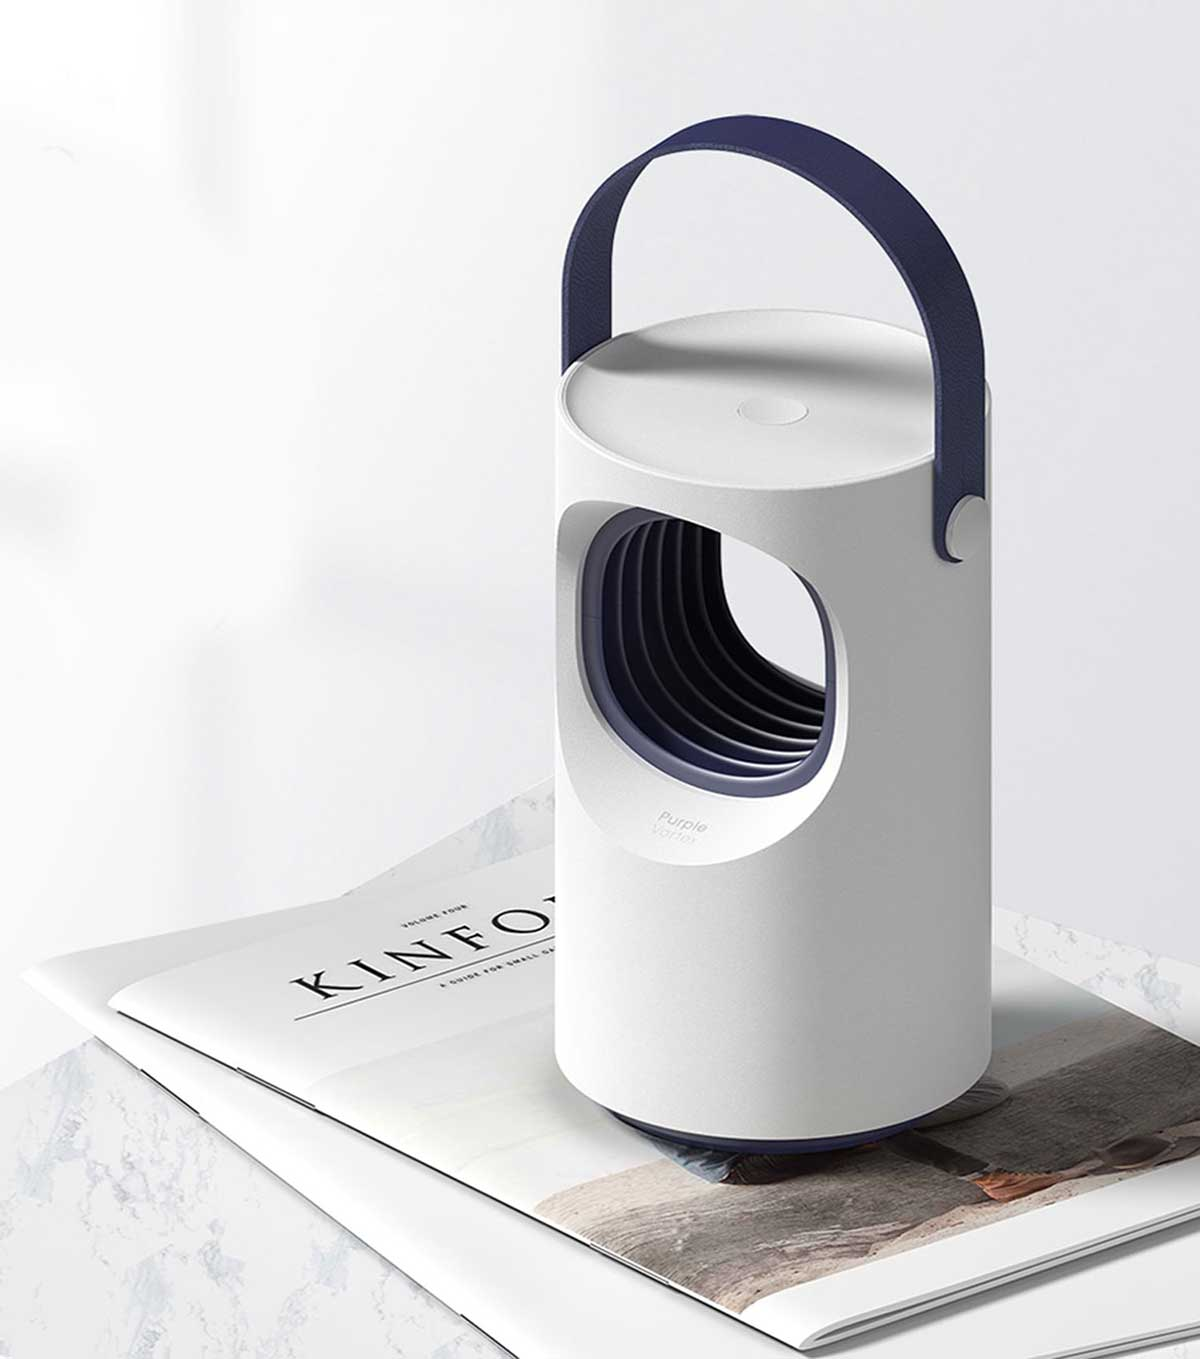 Baseus USB LED Light Electric Mosquito Killer Lamp